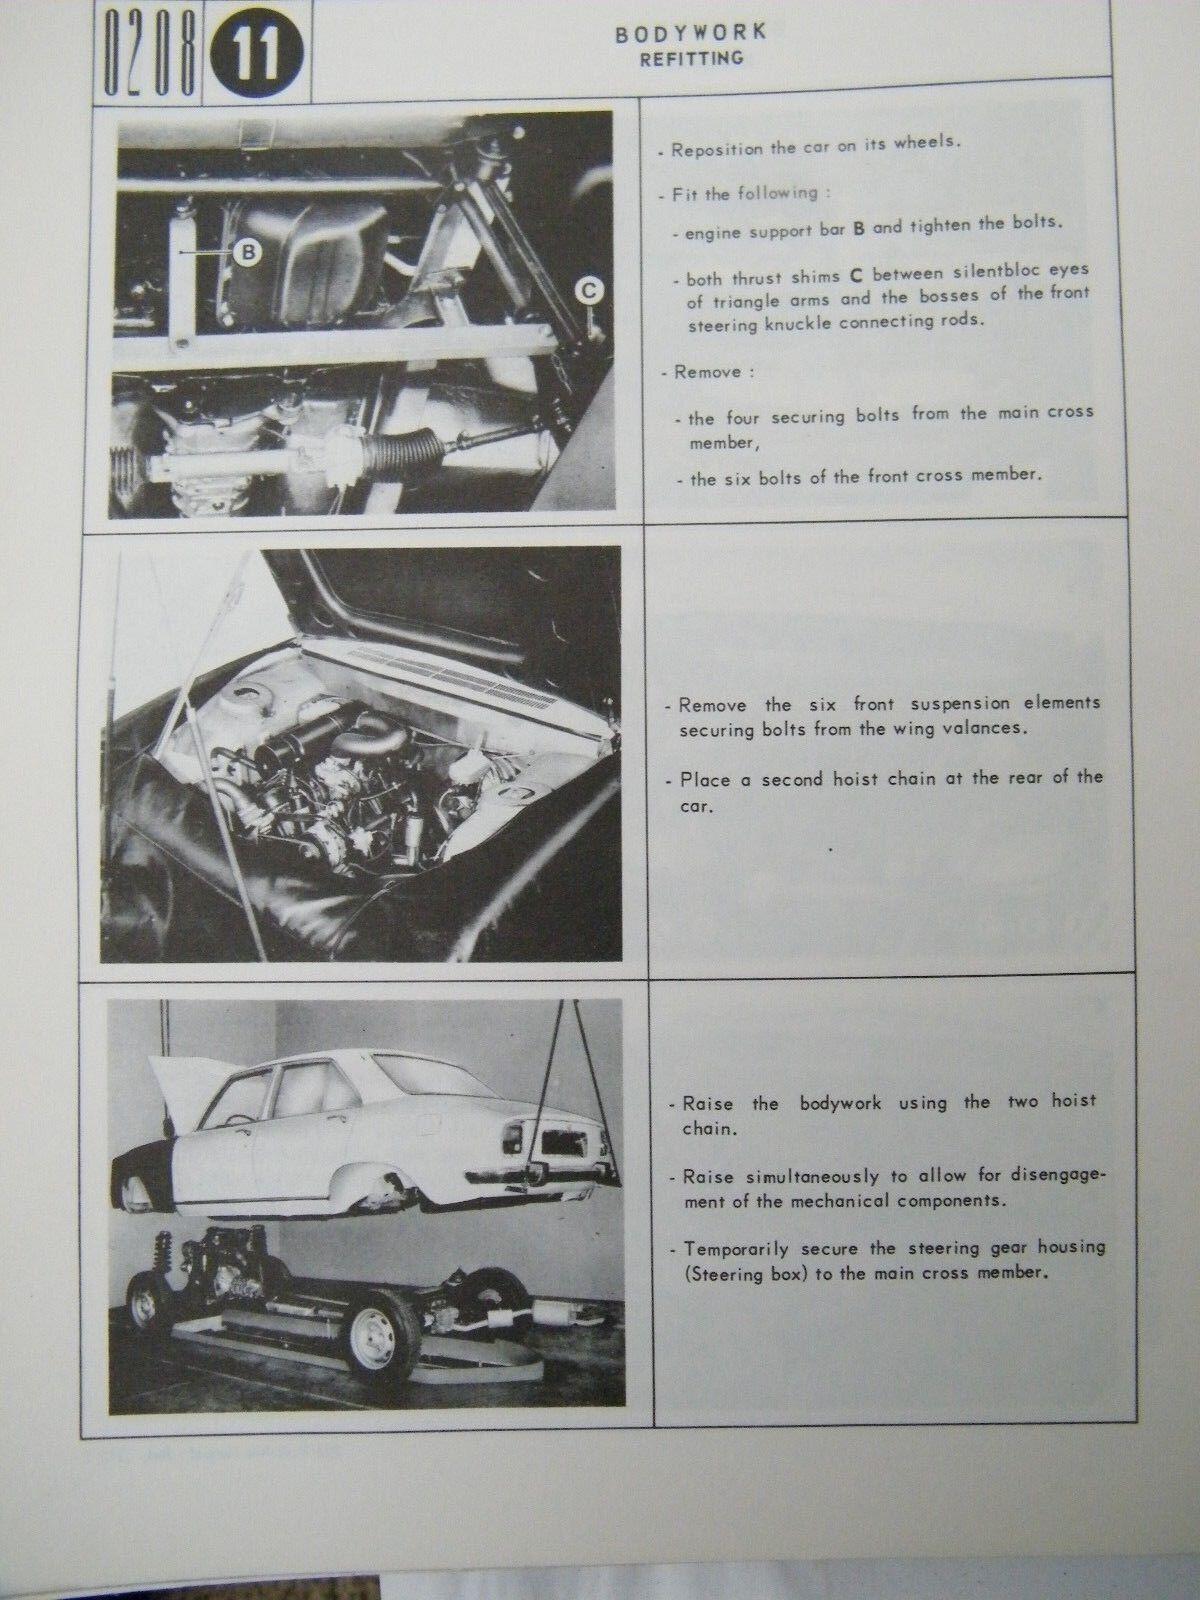 peugeot 504 factory shop service repair manual manuel d atelier rh picclick com Peugeot 604 Peugeot 505